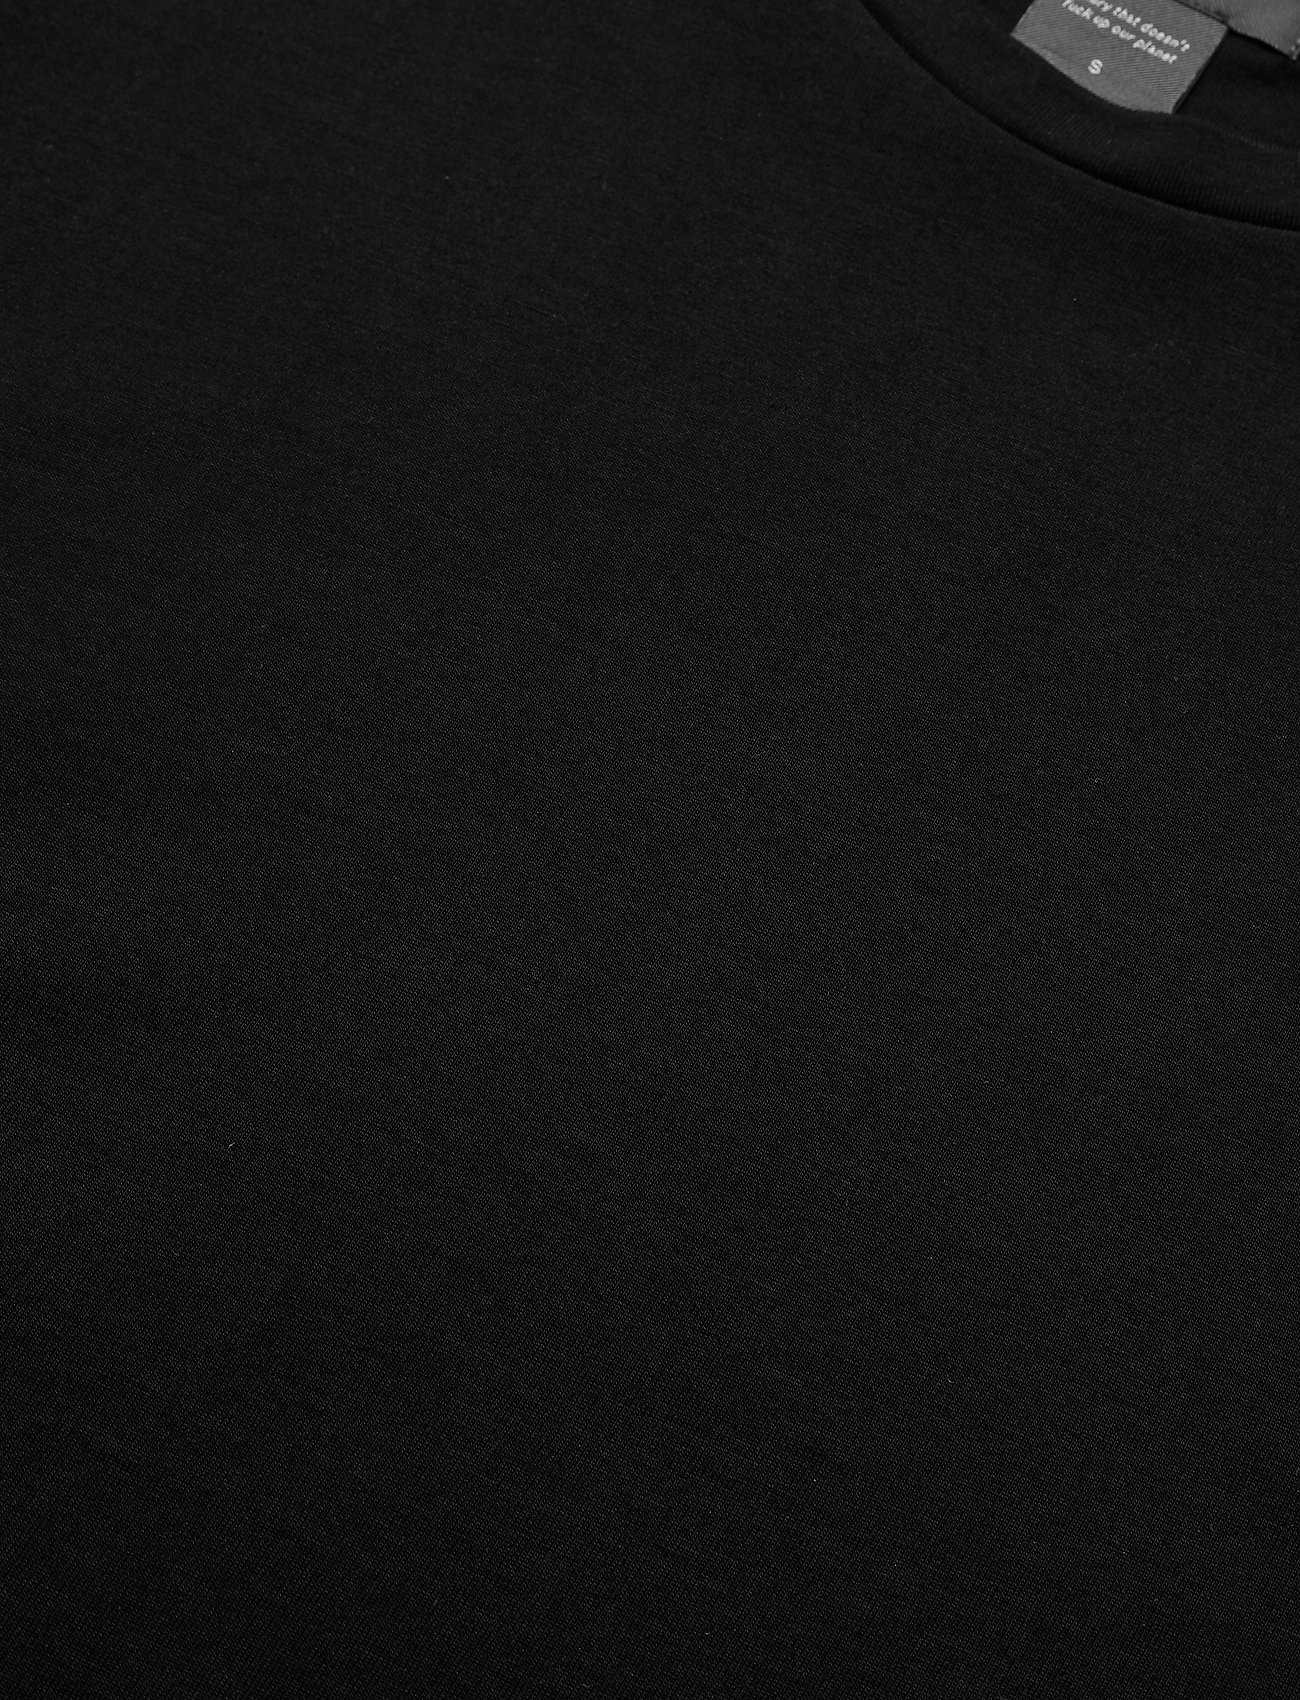 Residus OBI ORGANIC COTTON TEE - T-Shirts & Tops BLACK - Damen Kleidung